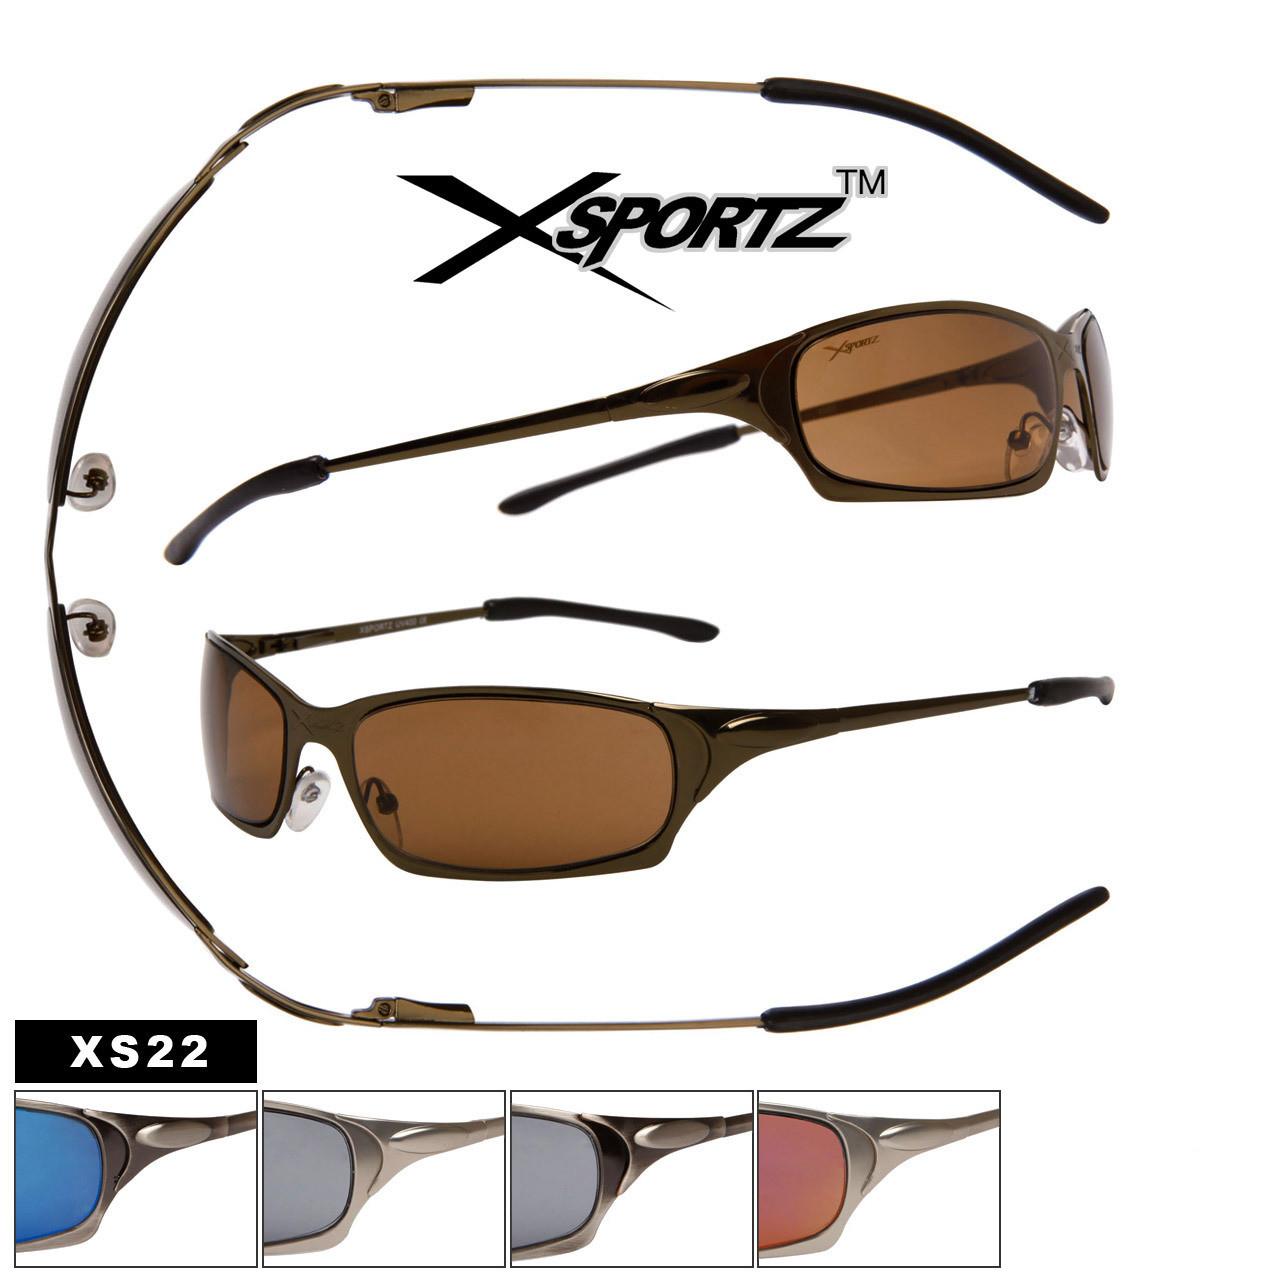 Metal Wholesale Sunglasses XS22